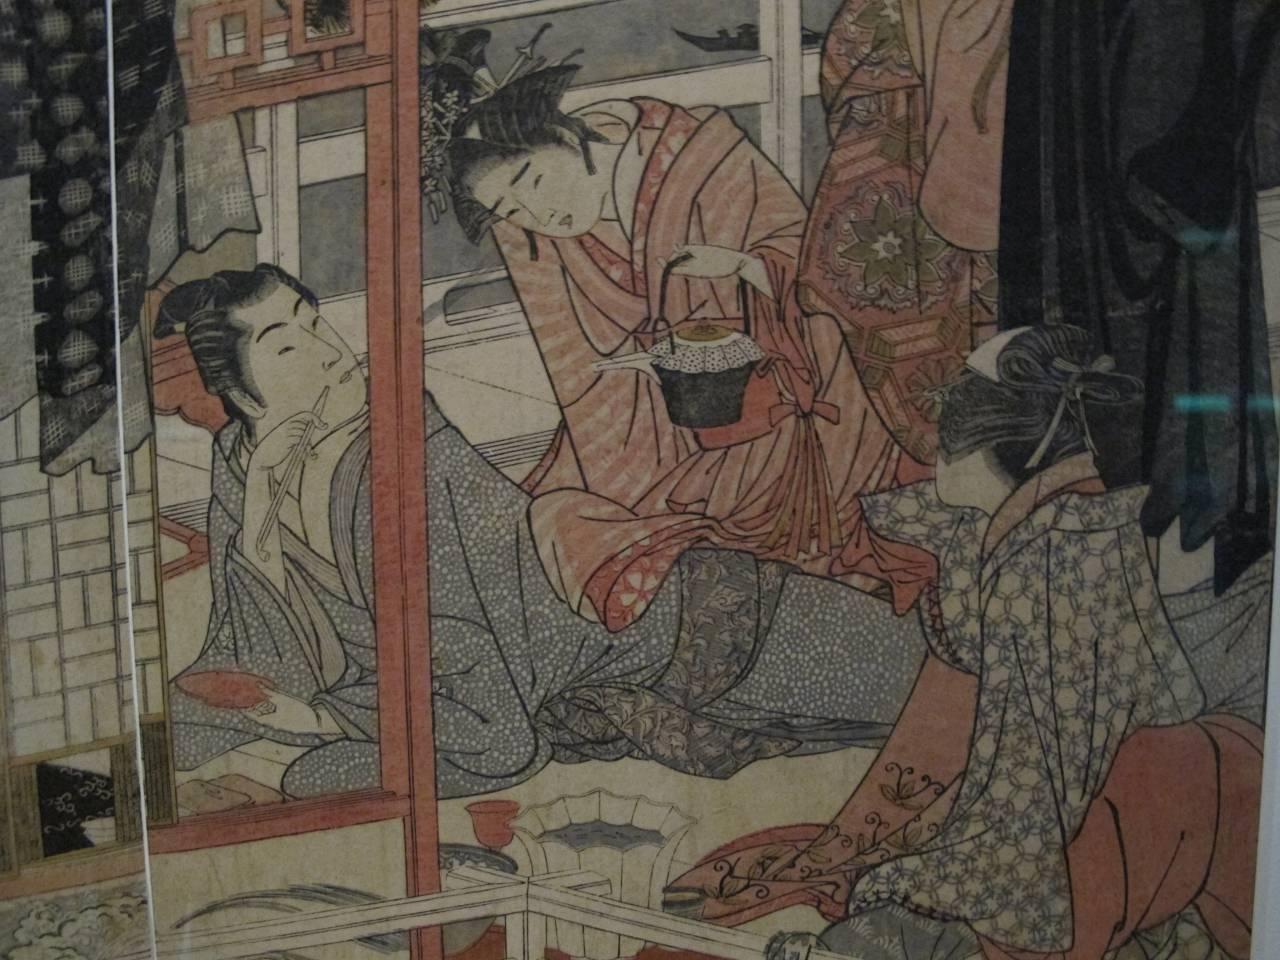 эротика у самураев